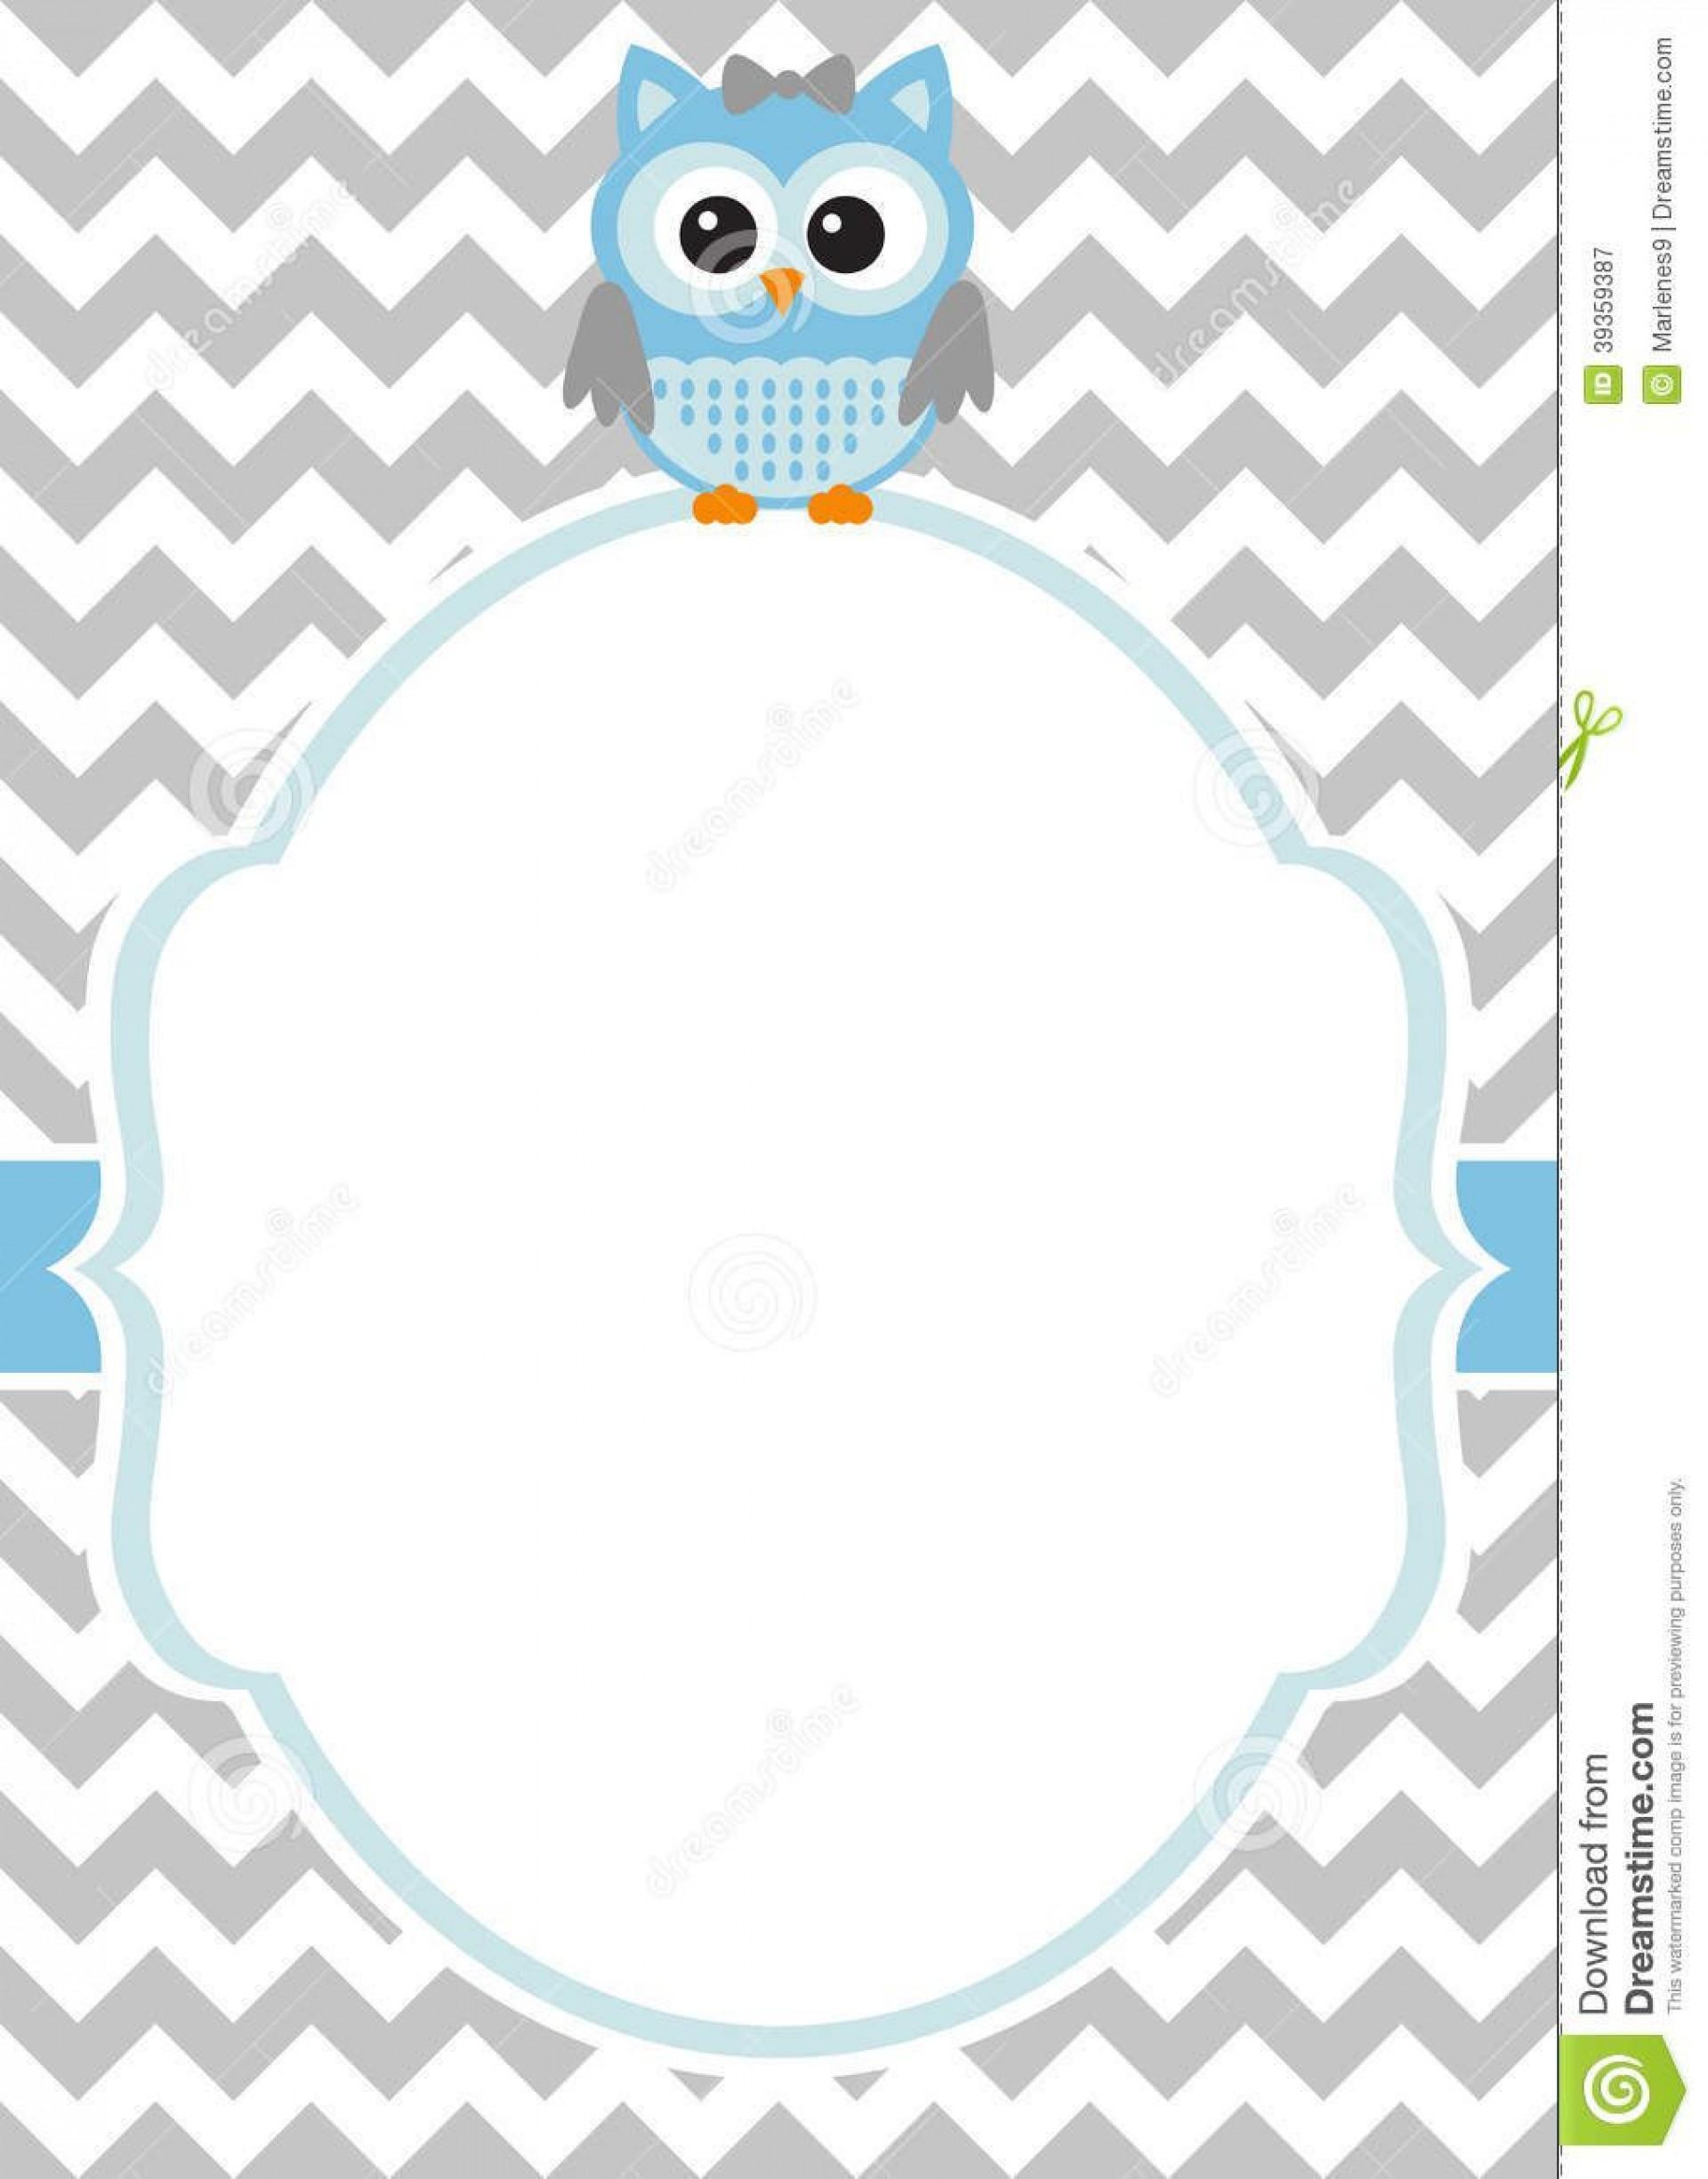 006 Sensational Free Printable Baby Shower Card For Boy Idea  Bingo1920